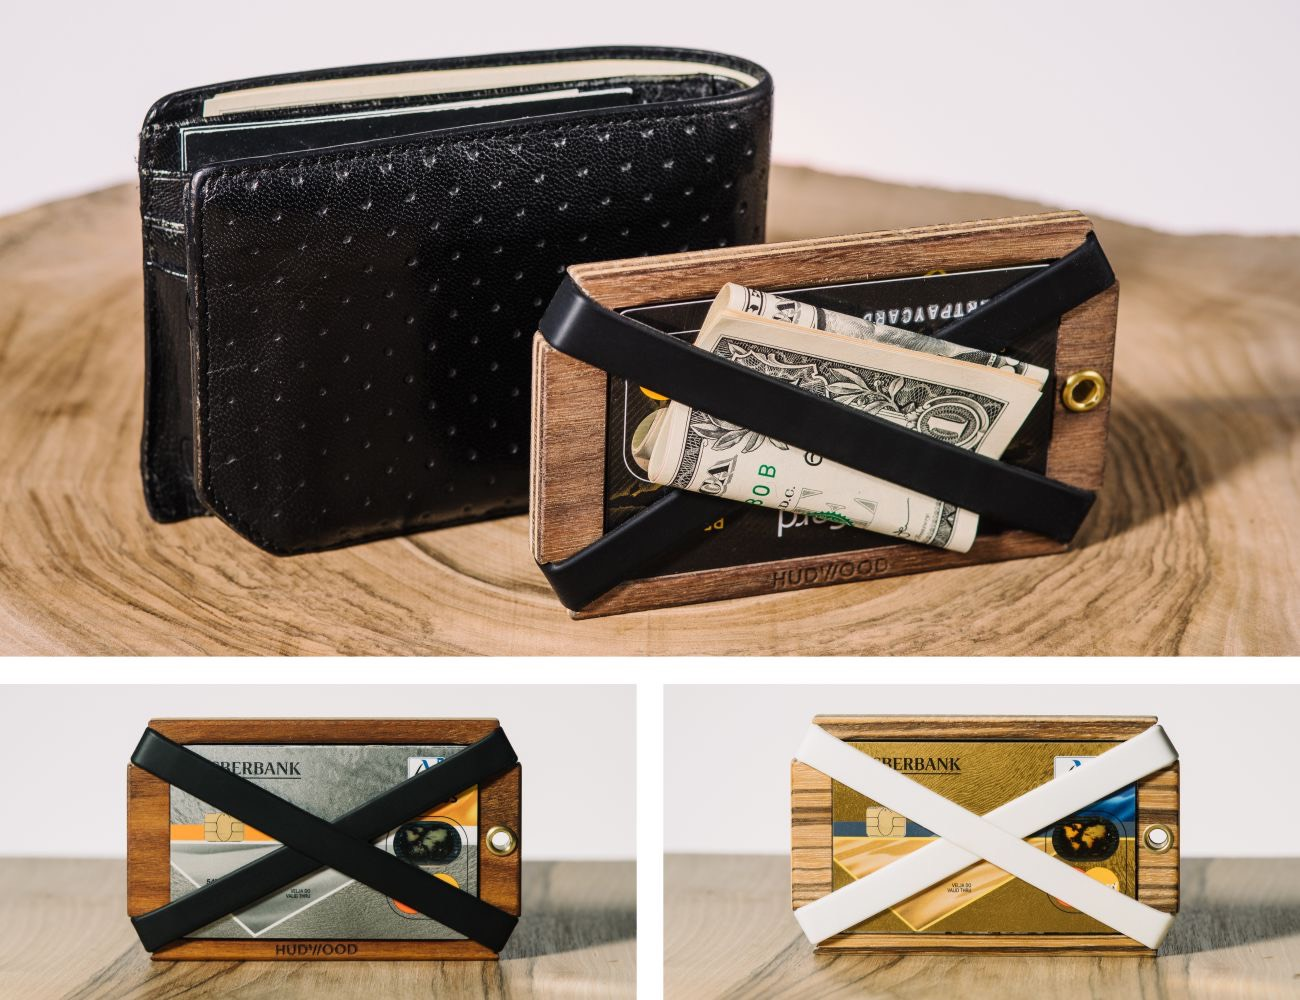 Hudwood – Wooden Carabiners And Wallet